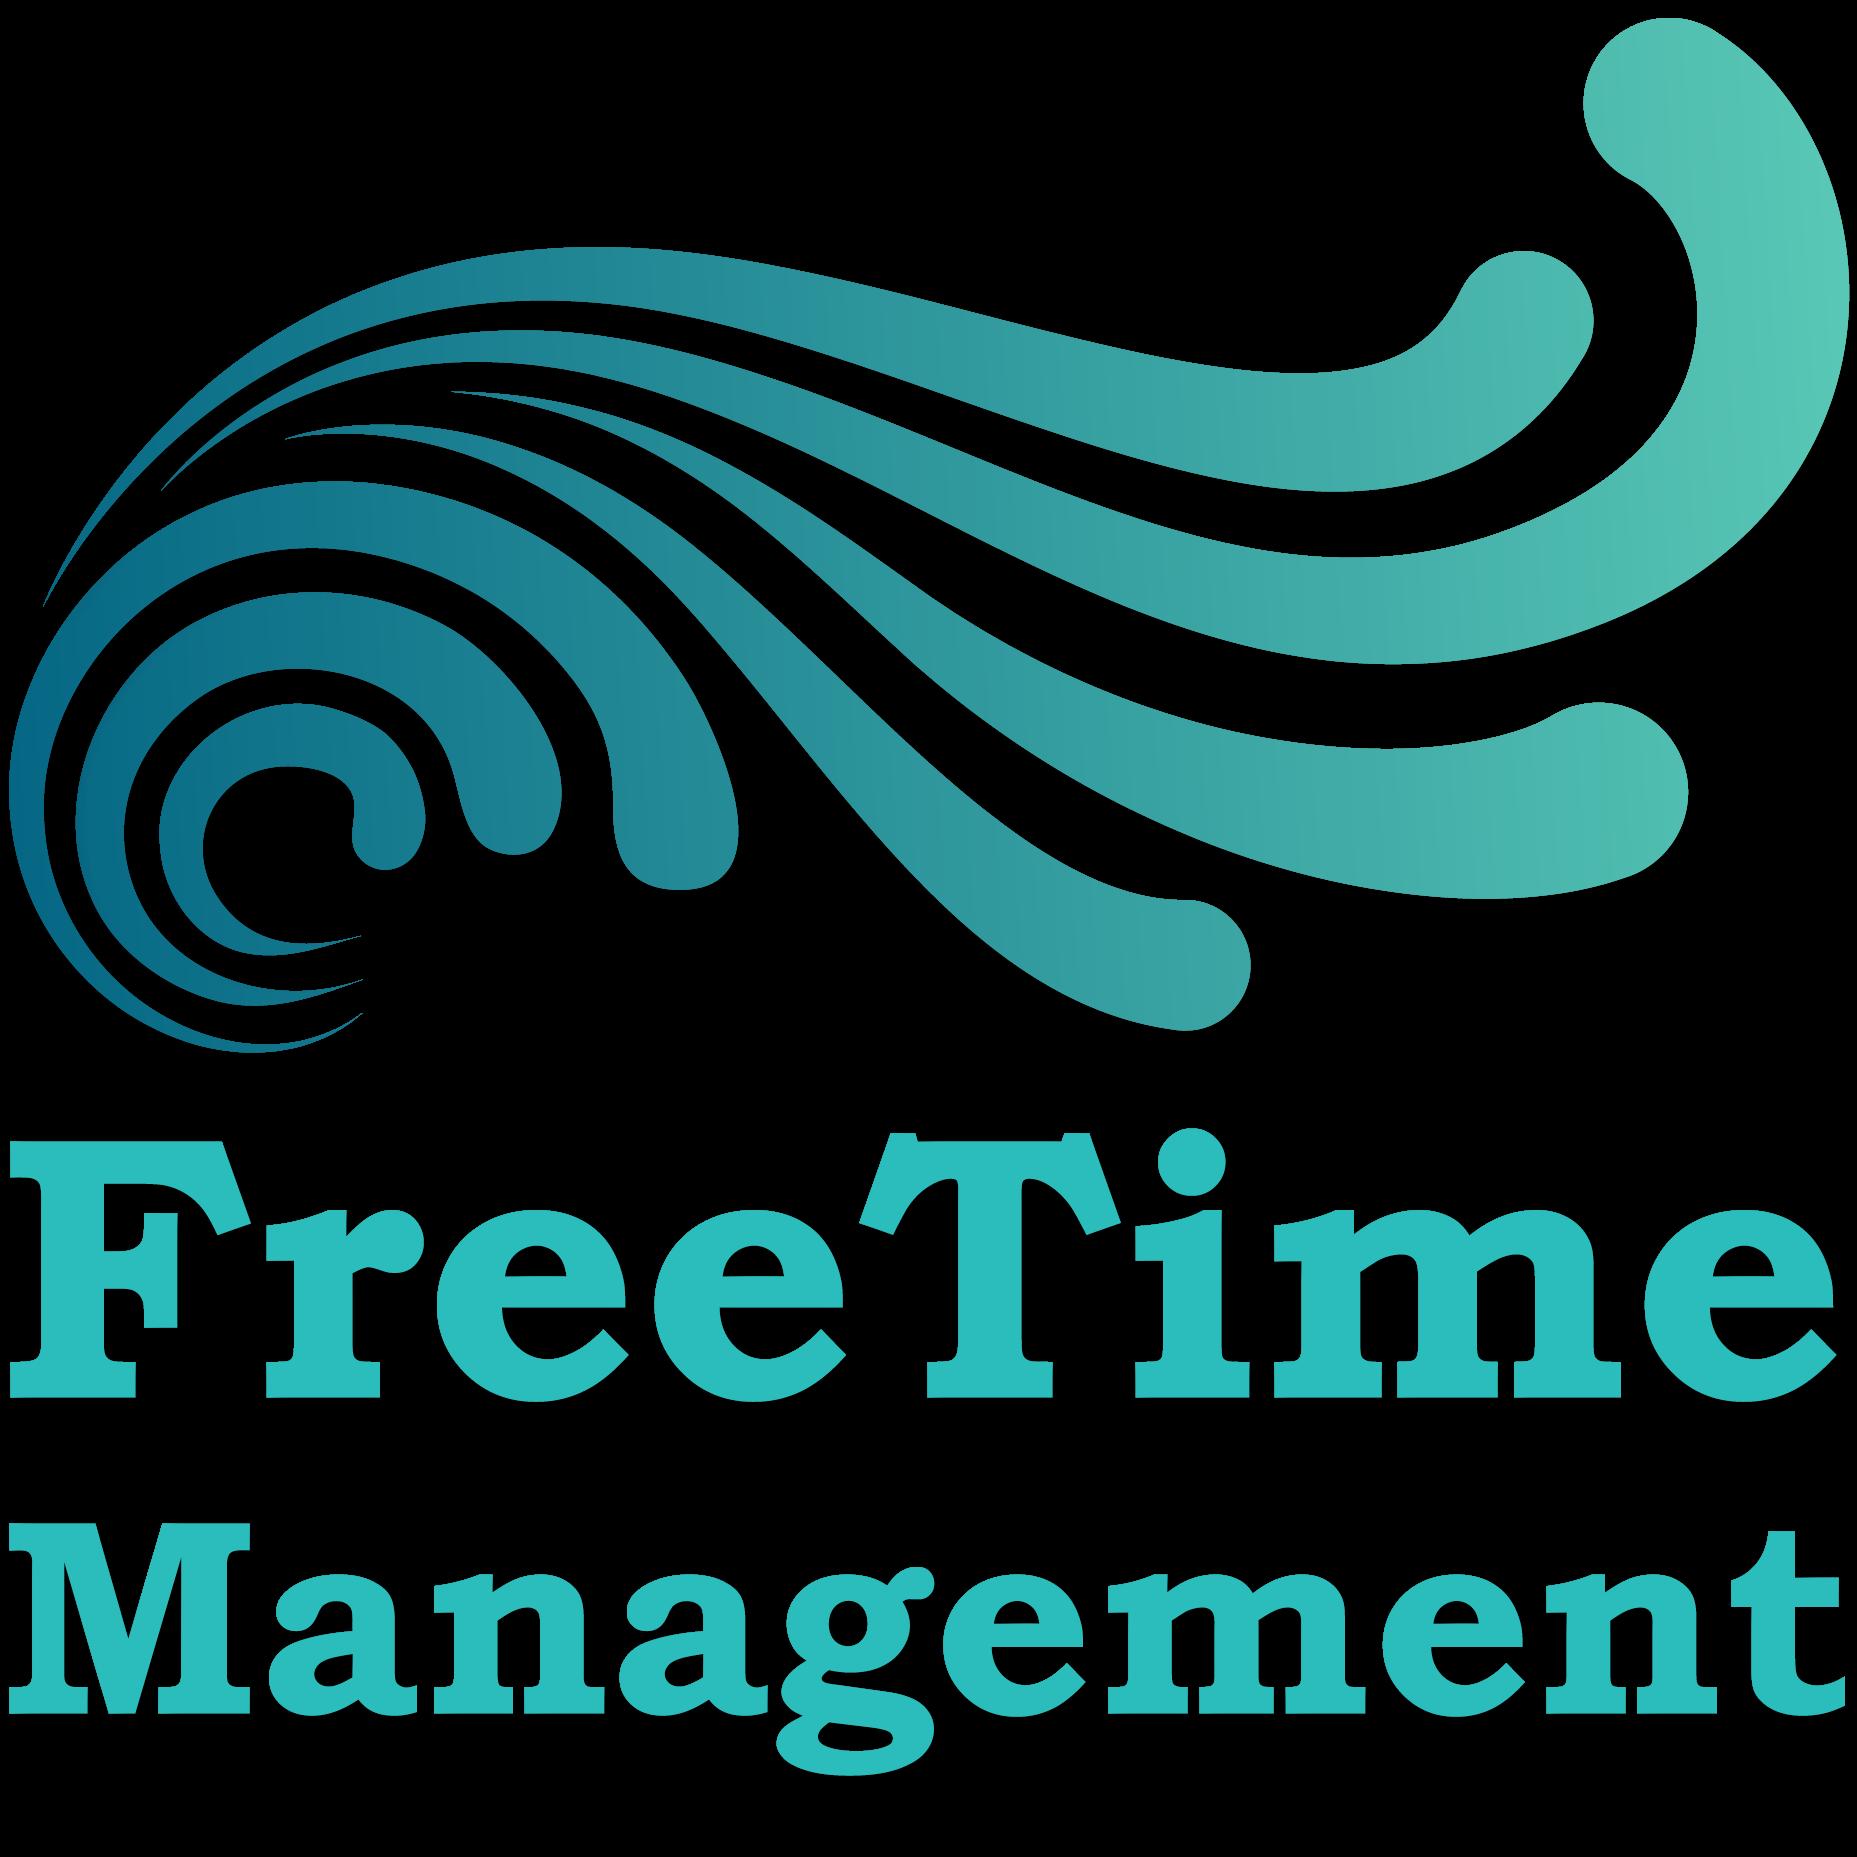 FreeTime Management